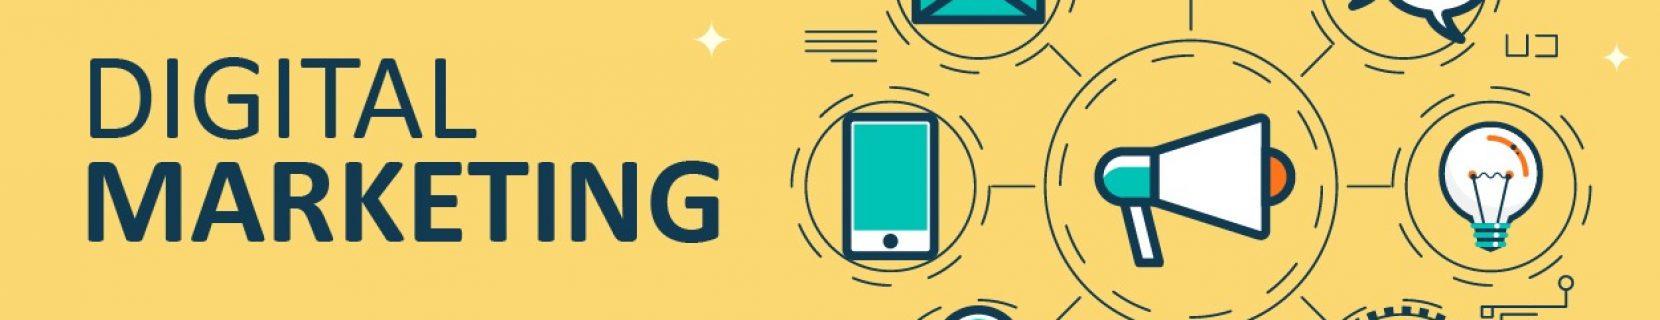 10 Cara Belajar Digital Marketing Sampai Mahir Untuk Pemula